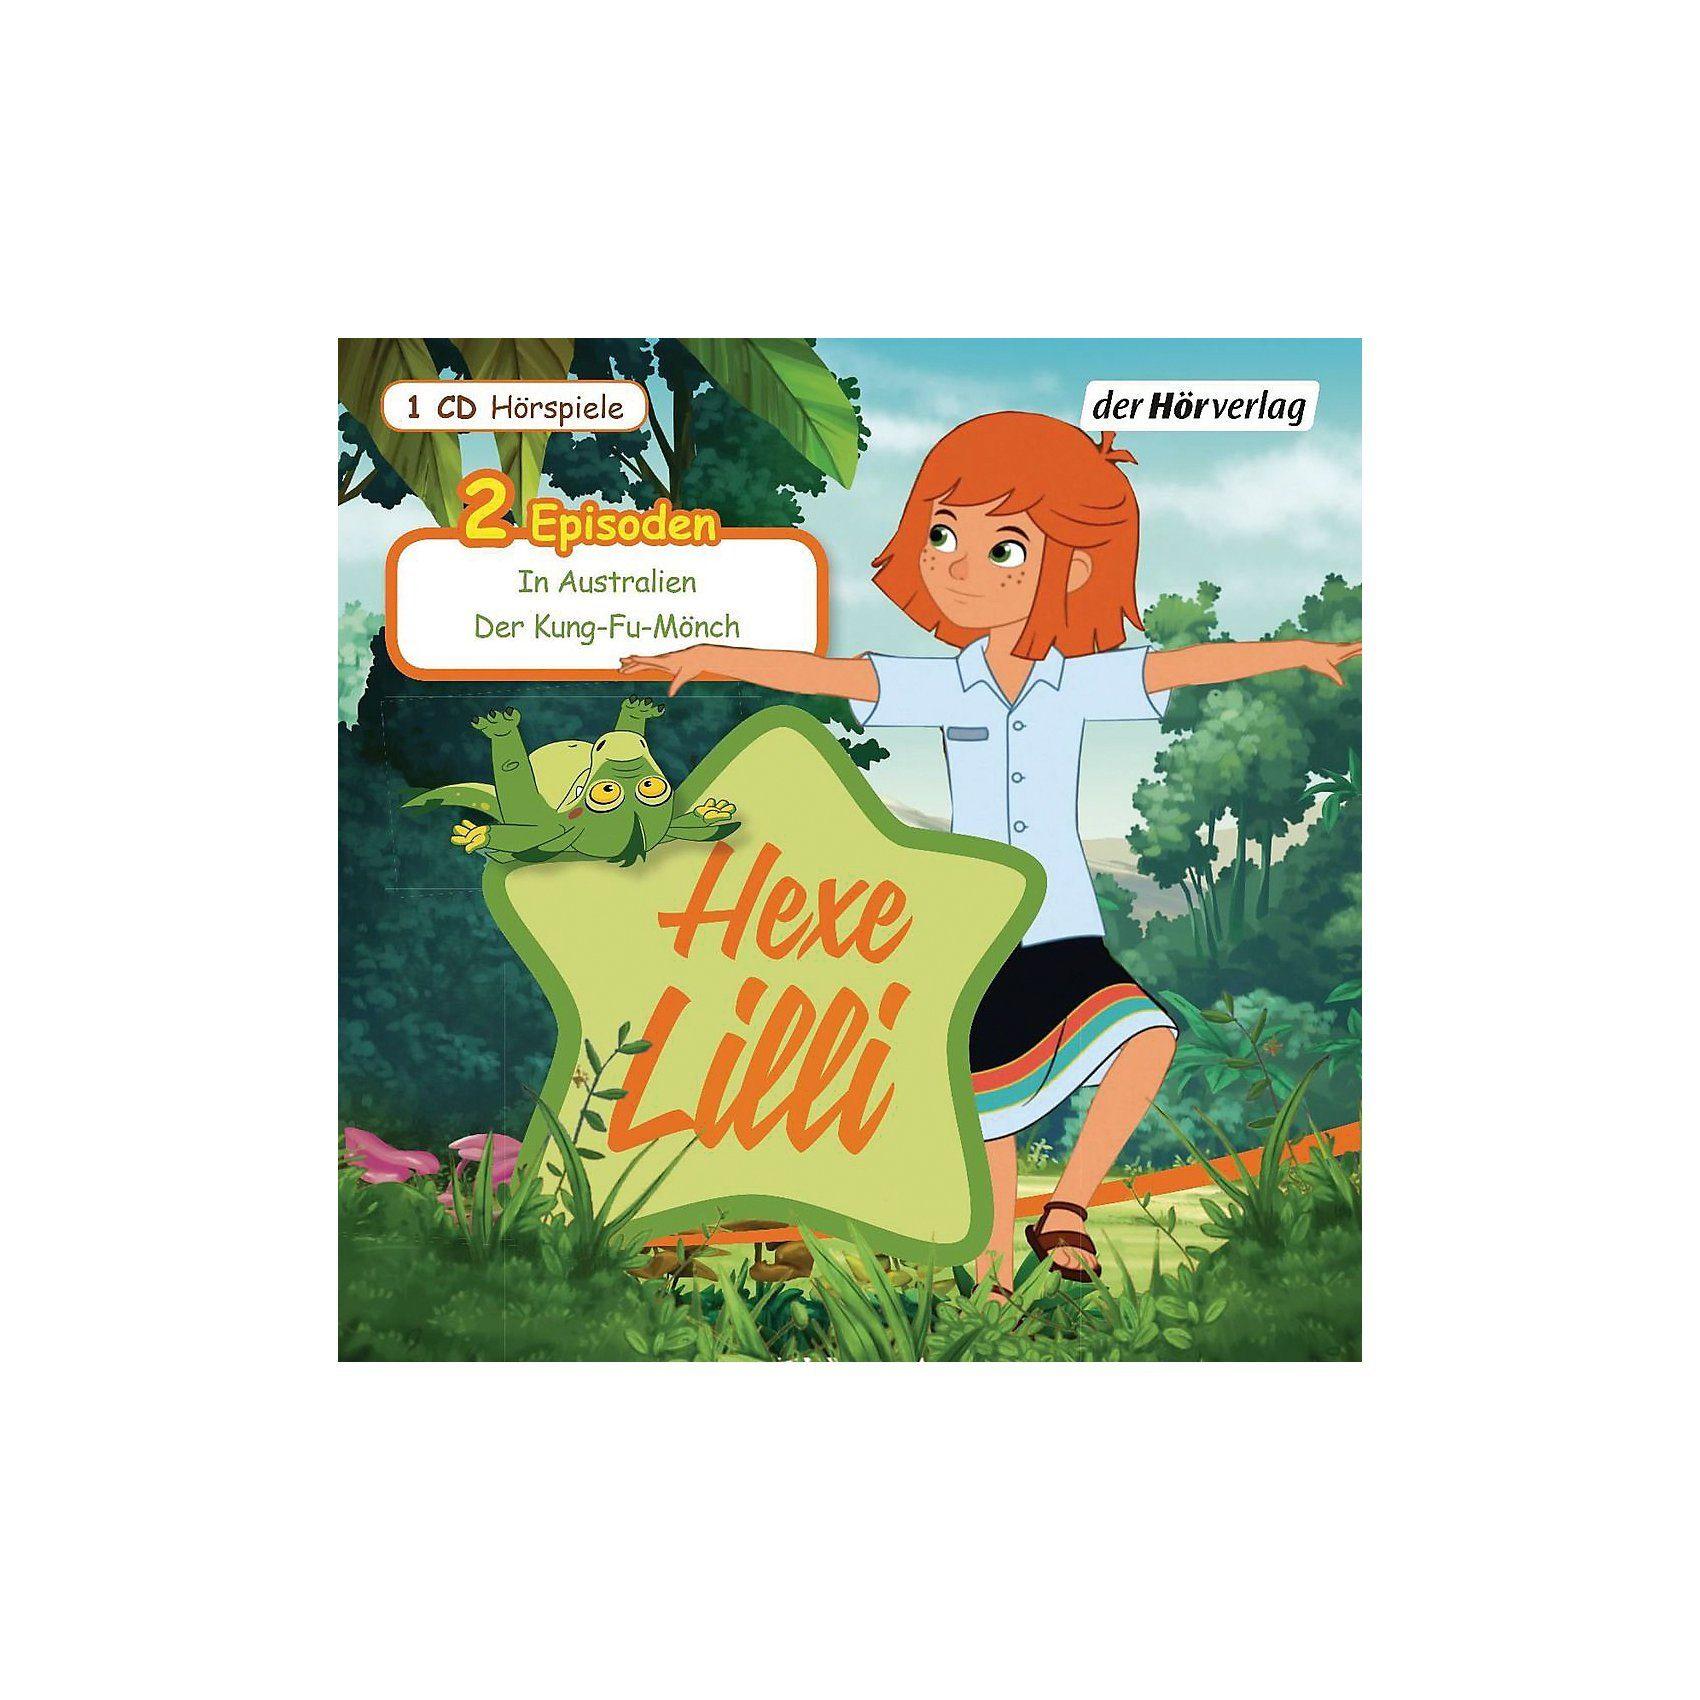 Edel CD Hexe Lilli 11 - In Australien/Der Kung-Fu-Mönch